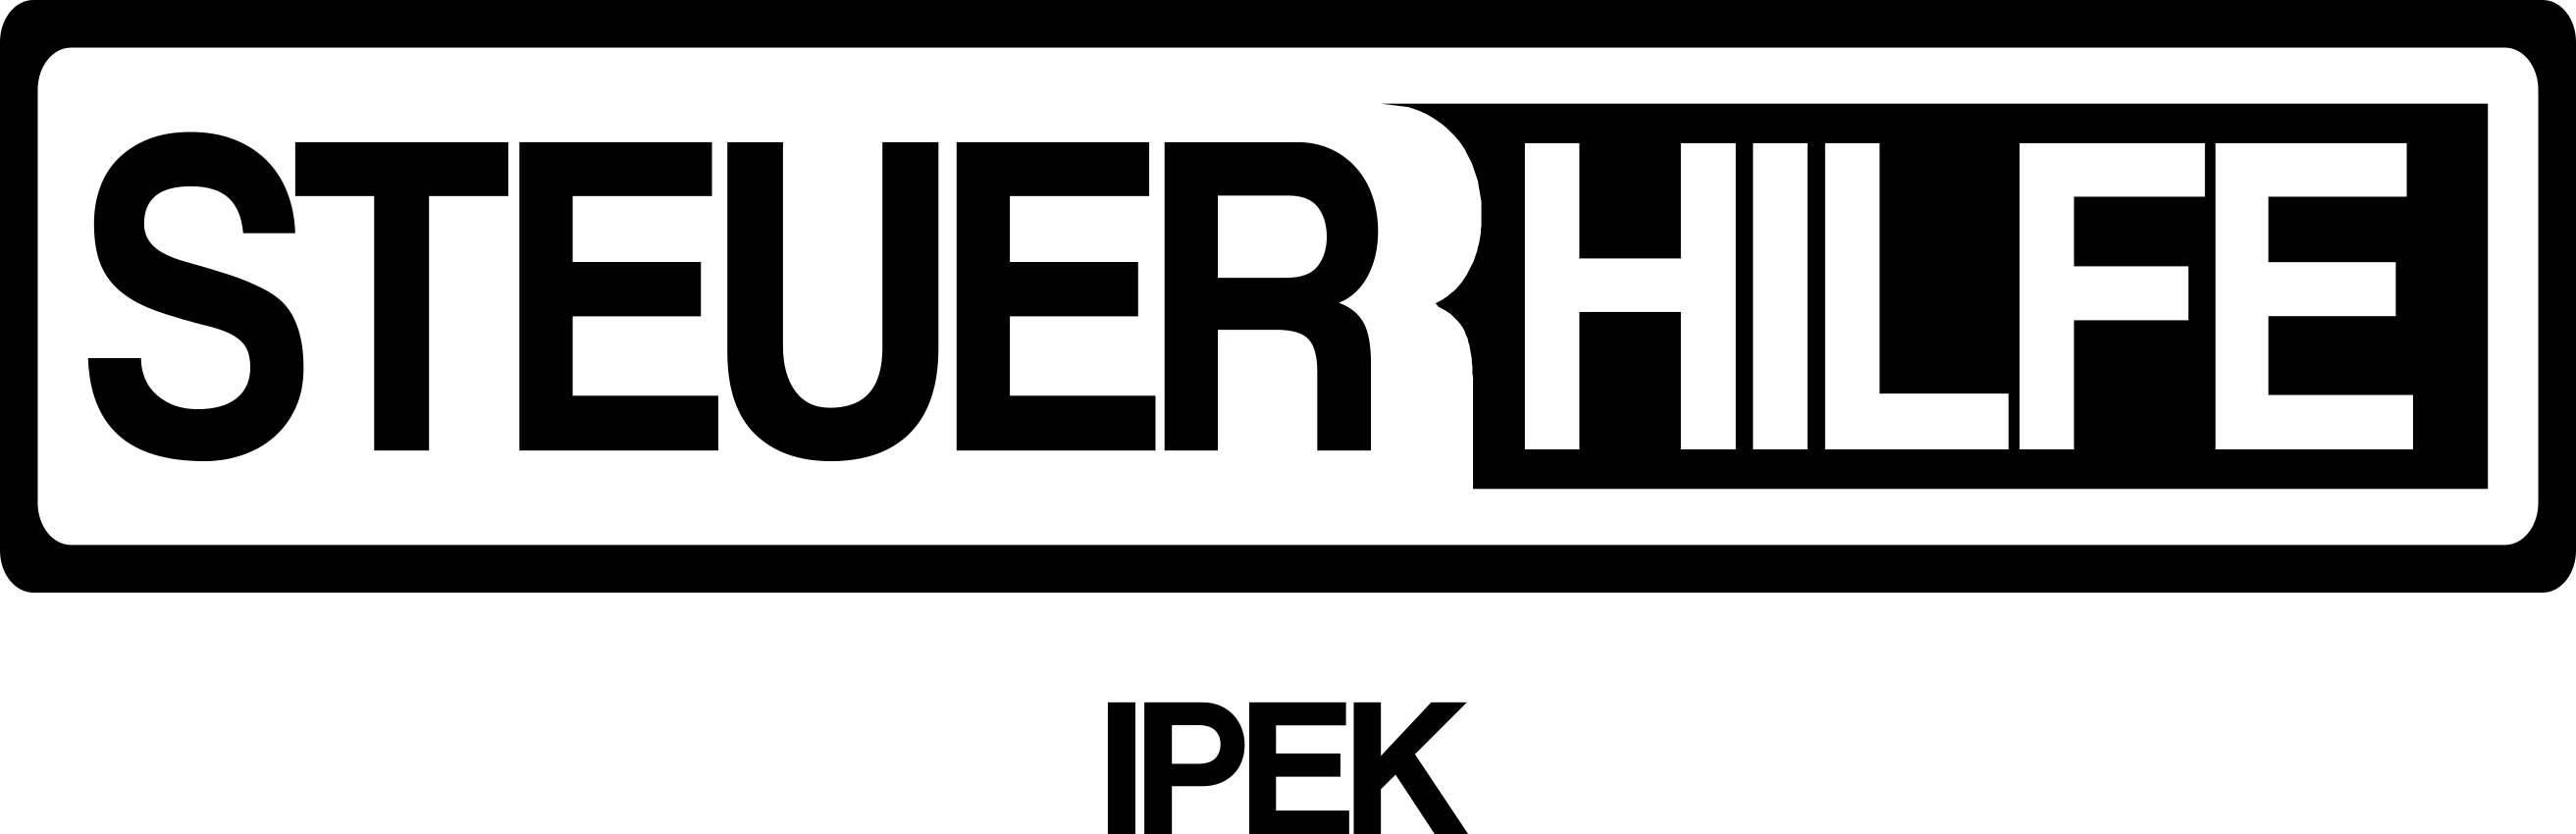 Logo high resolution